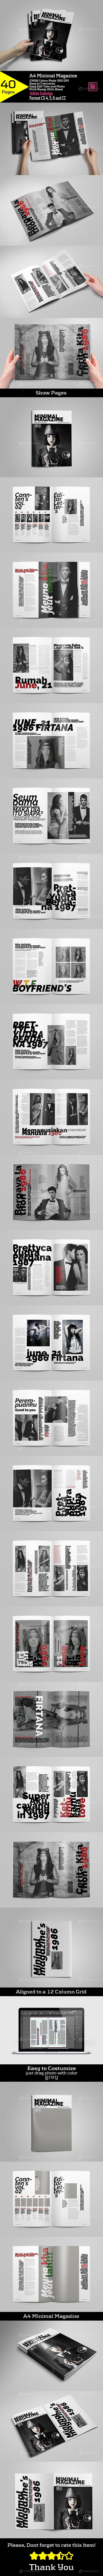 A4 Minimal Magazine Vol.2